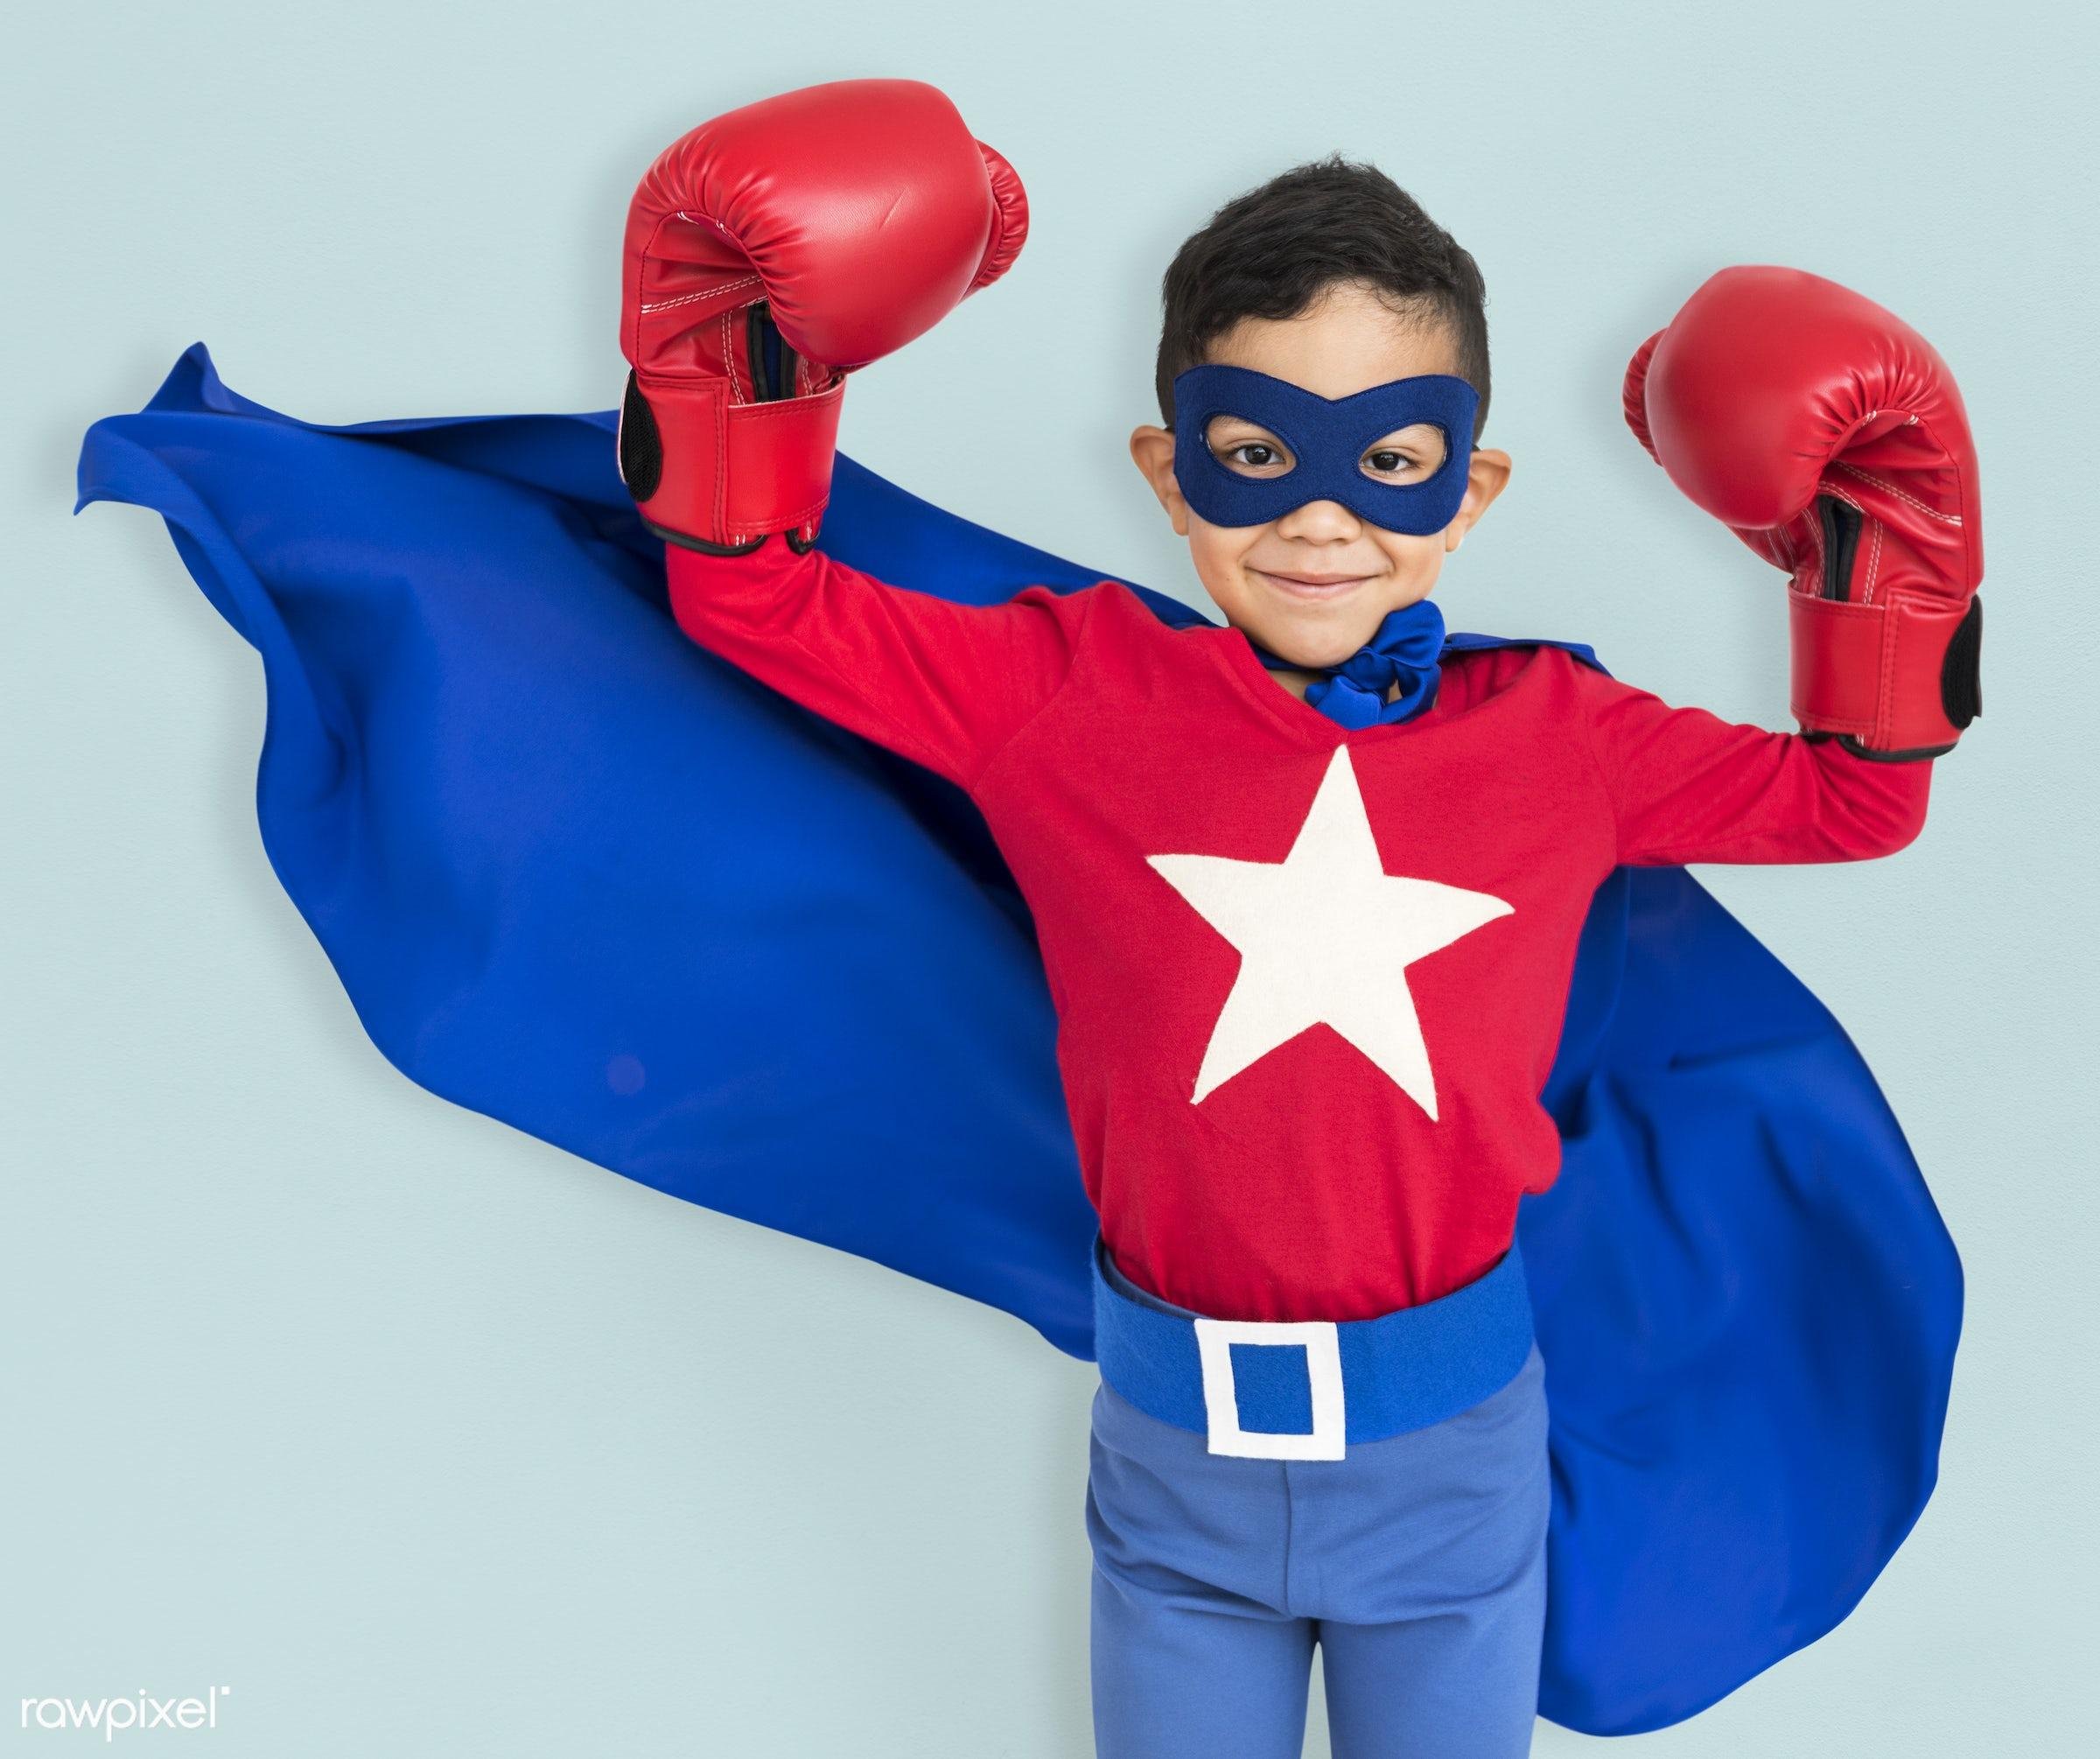 brave, people, adolescence, kid, bold, fearlessness, friends, inspiration, childhood, idol, generation, unafraid, gutsy,...